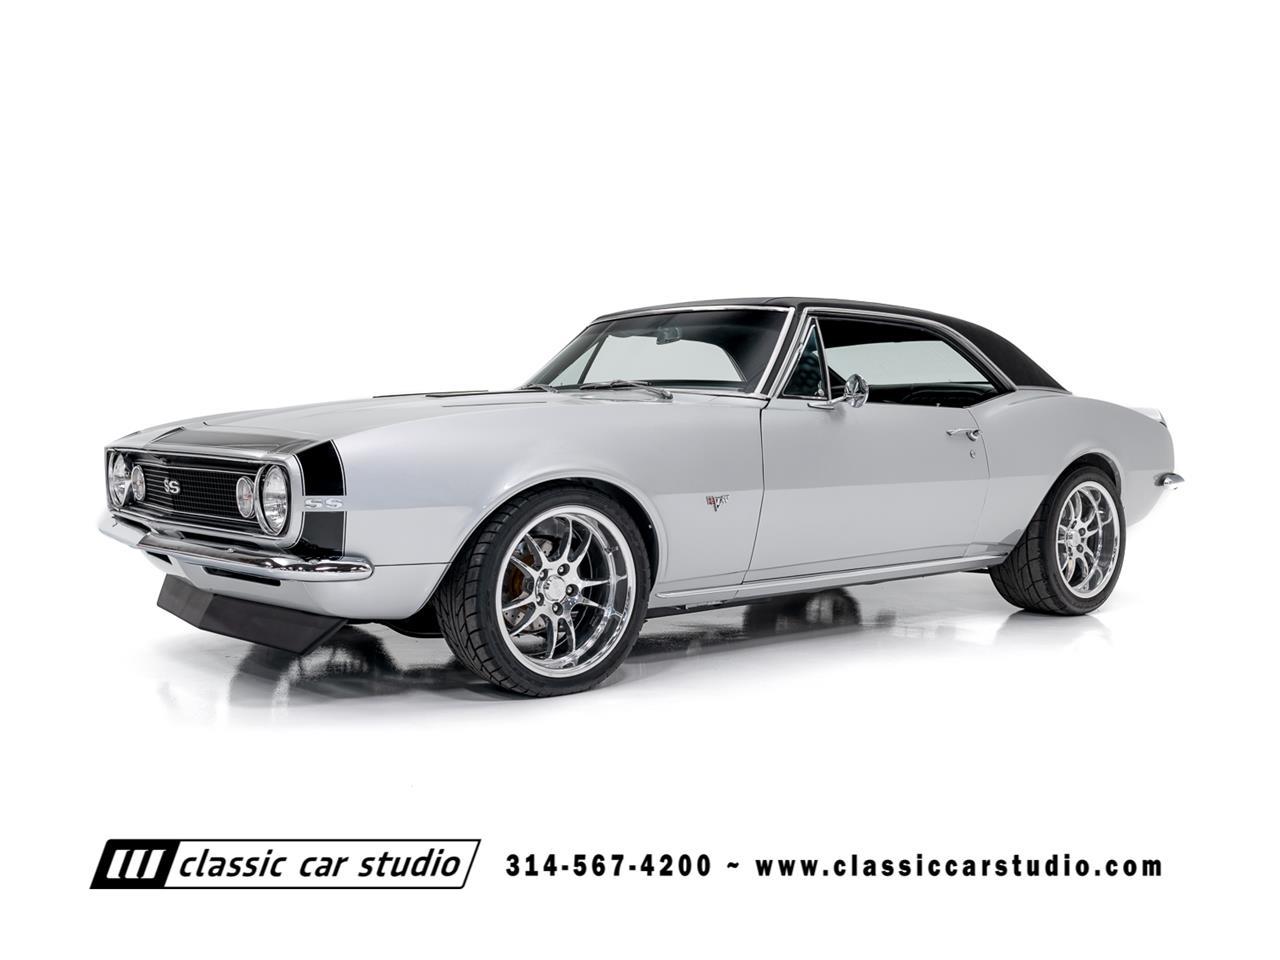 For Sale 1967 Chevrolet Camaro Ss In Saint Louis Missouri